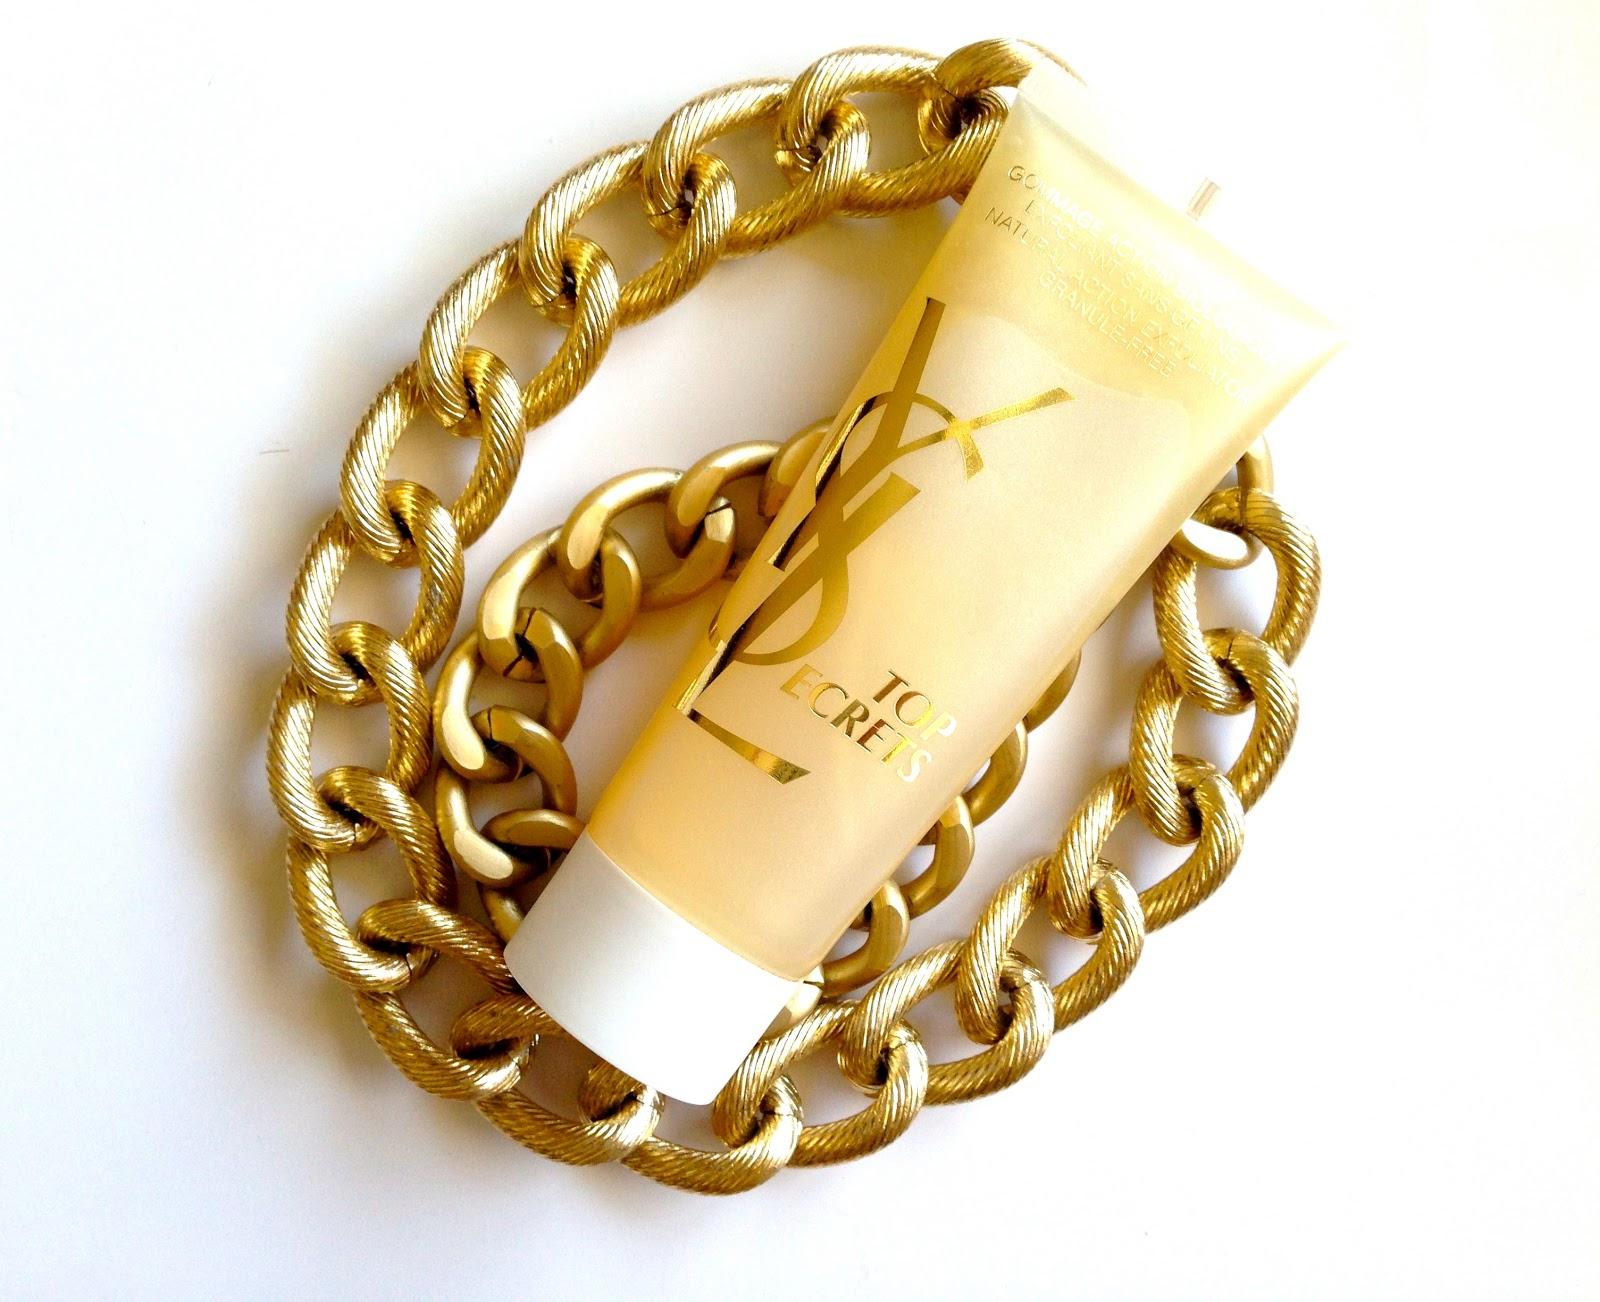 Peeling enzymatyczny na bogato. Złoty peeling Natural Action Exfoliator Yves Saint Laurent